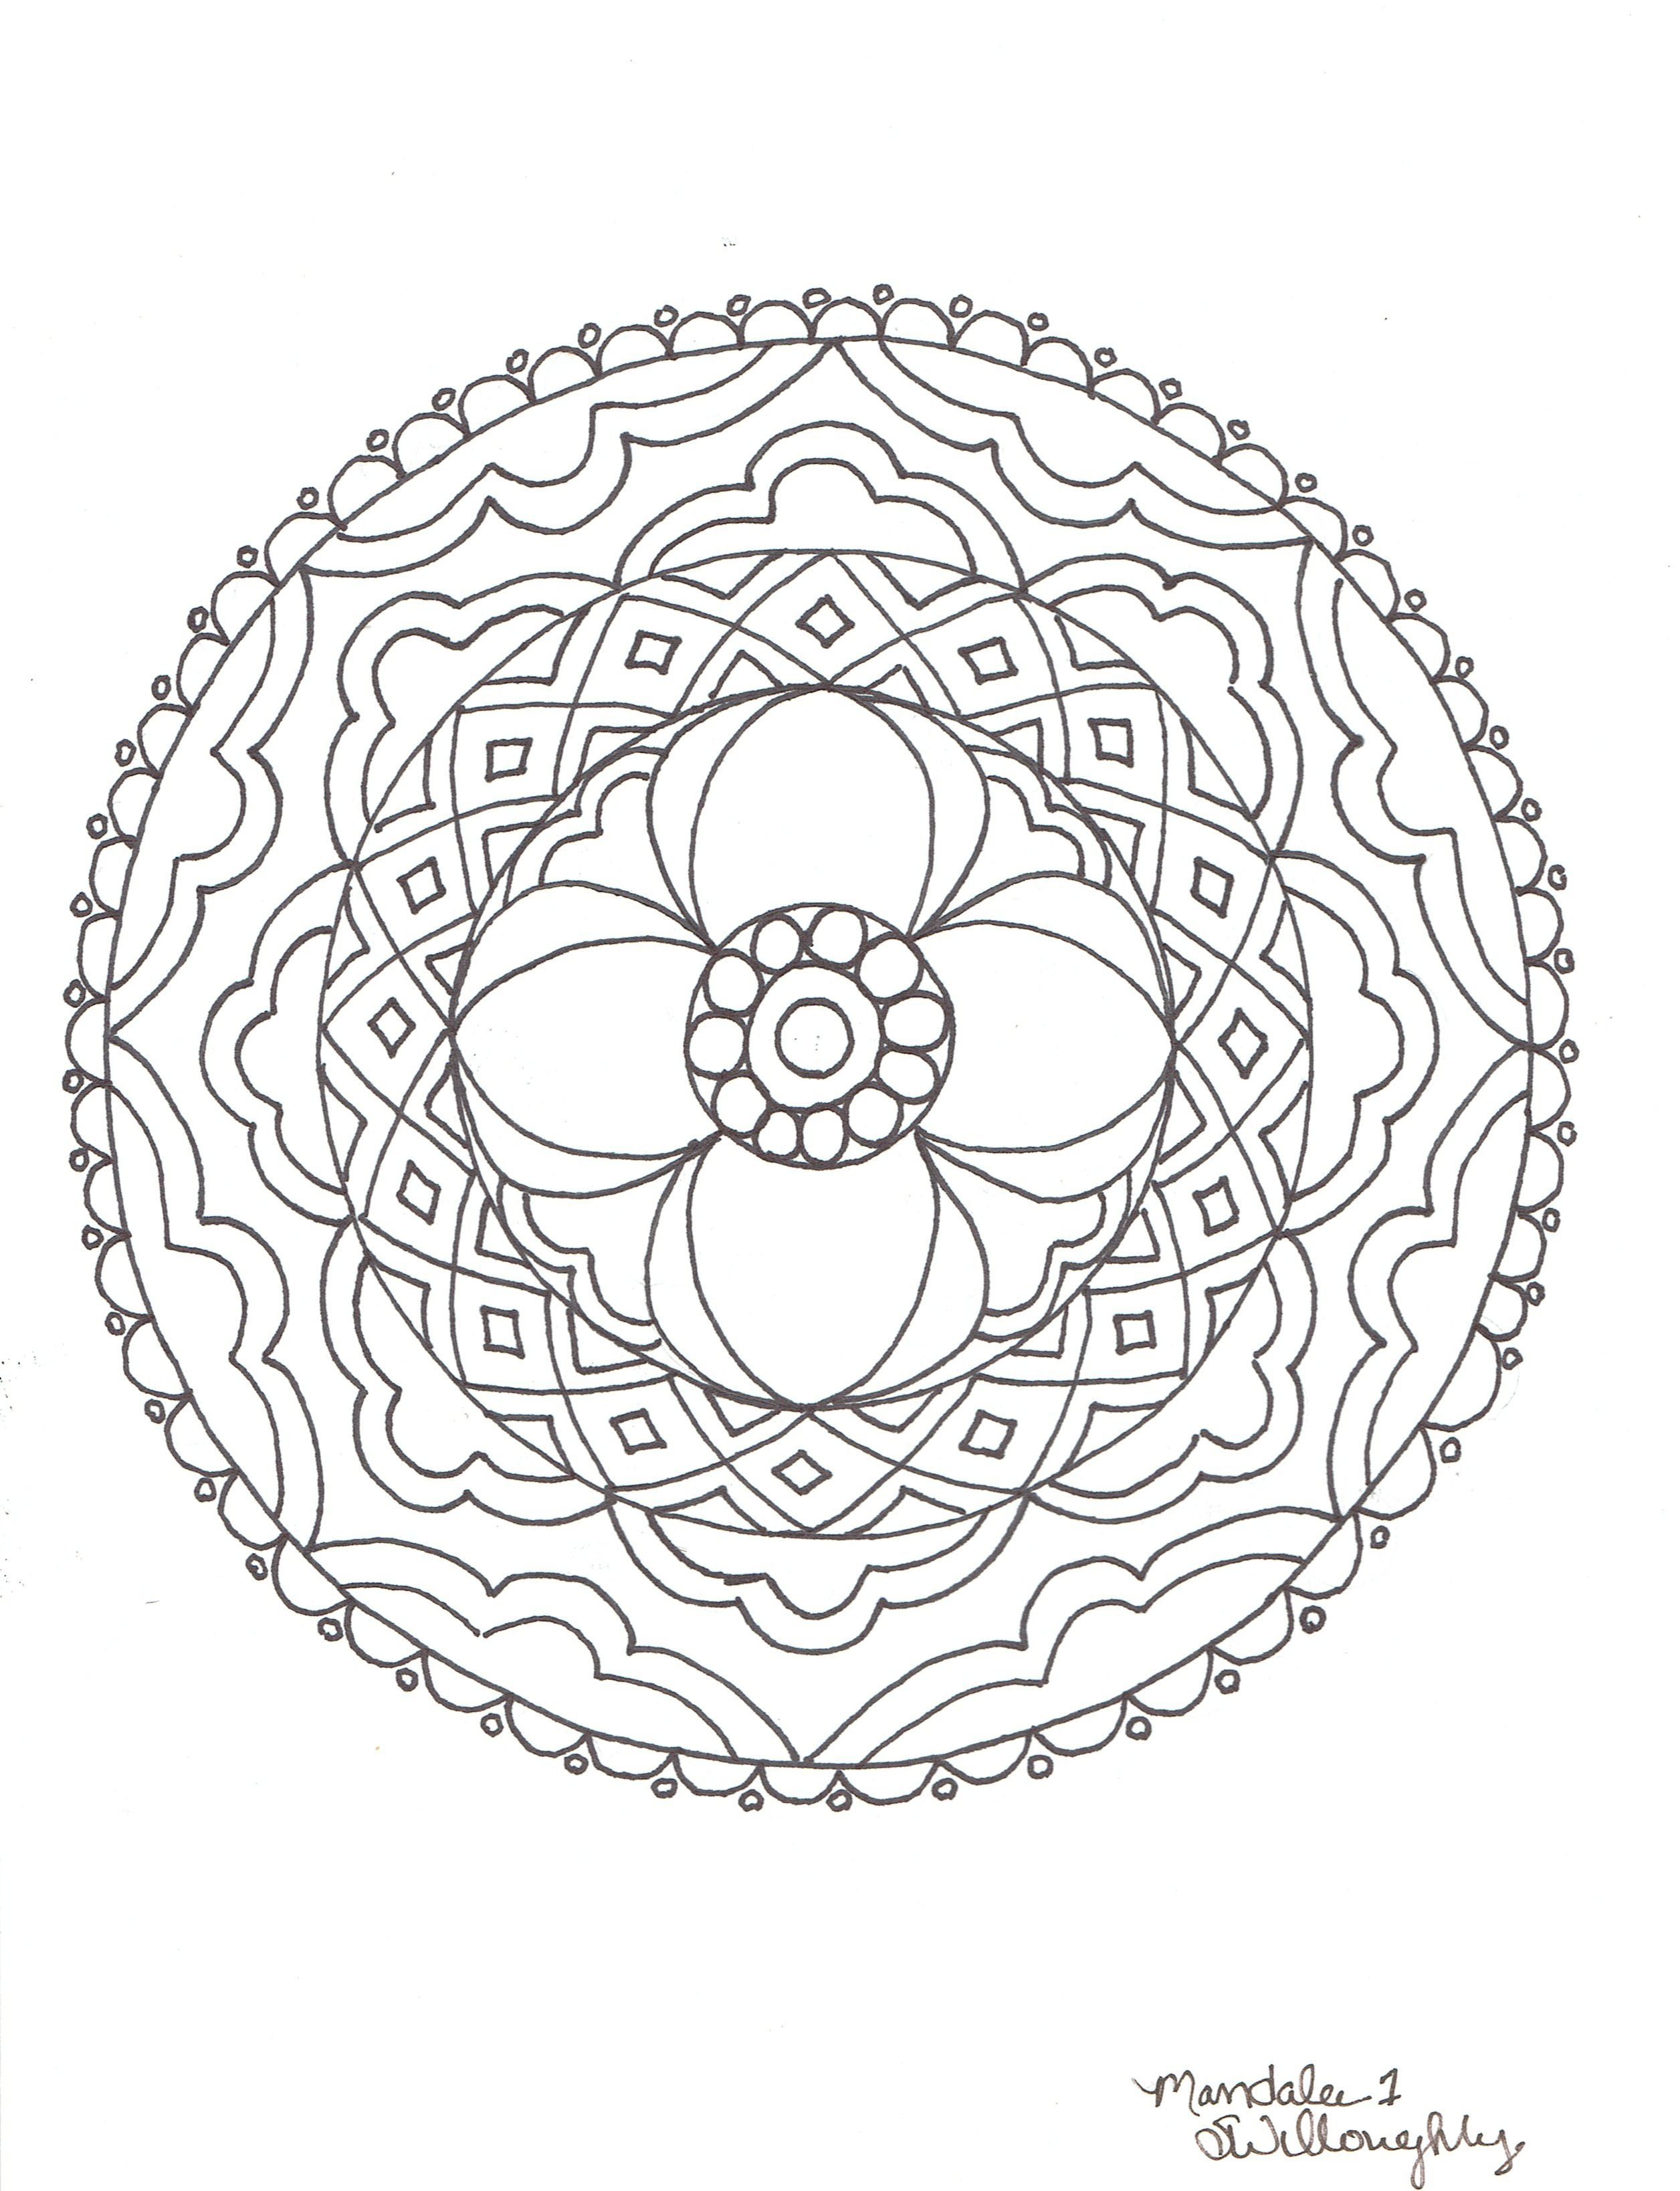 Mandala coloring page by SW | Mandalas | Pinterest | Mandalas ...